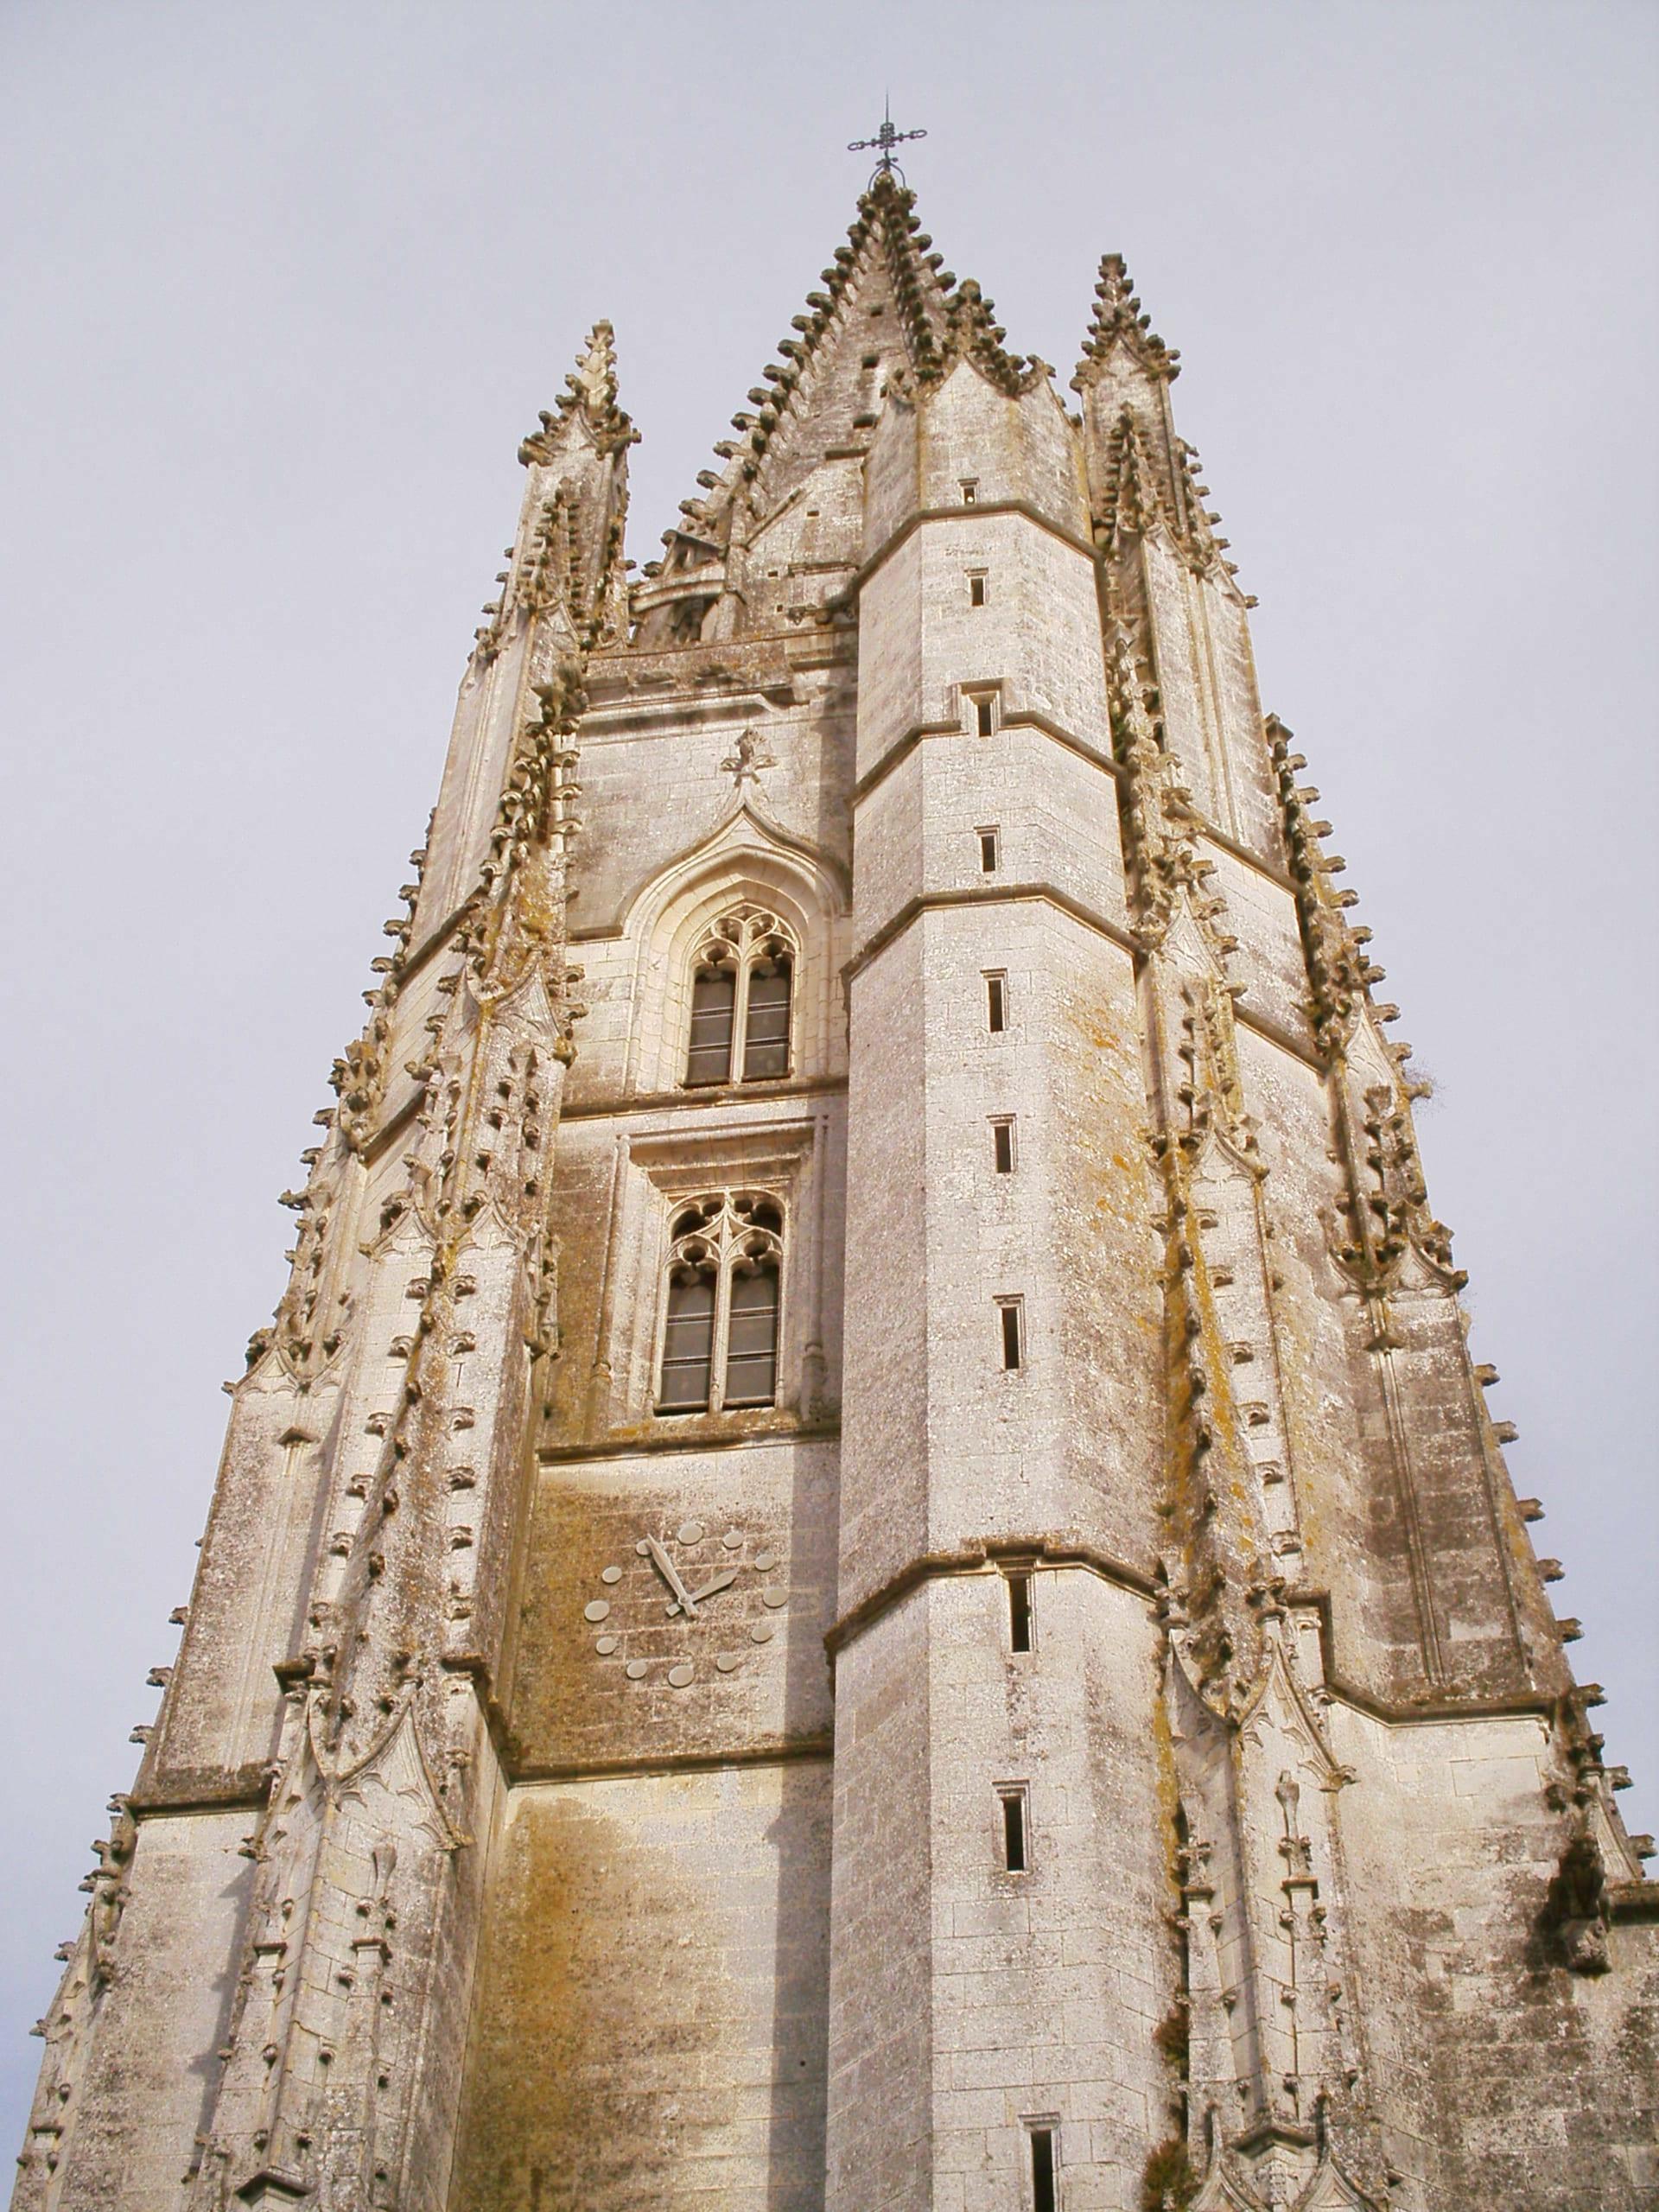 Eglise Sainte Eutrope, Saintes, Charente-Maritime